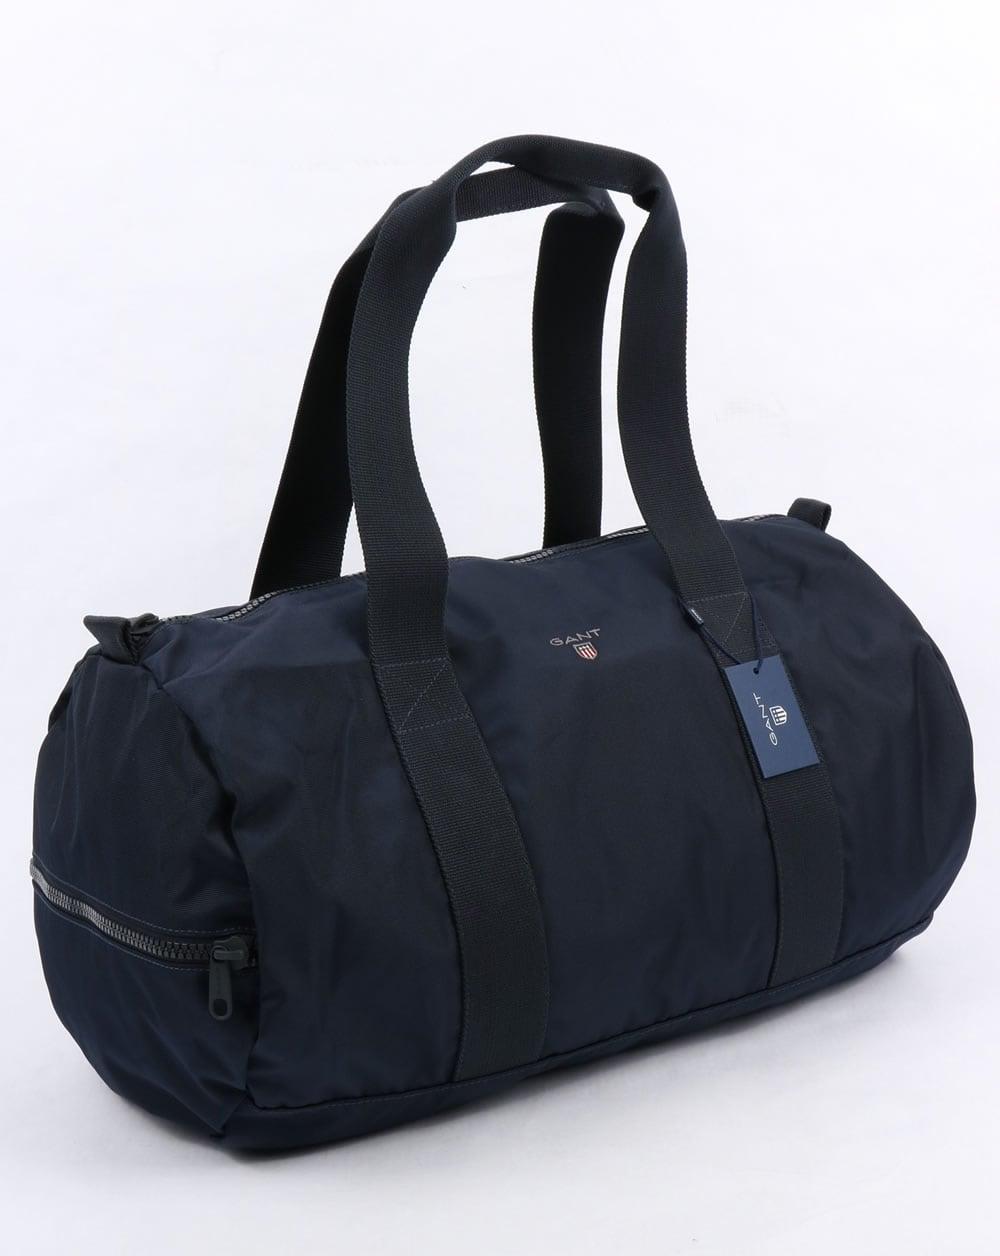 a32d0fecdb Gant Gant Original Barrel Travel Bag Marine